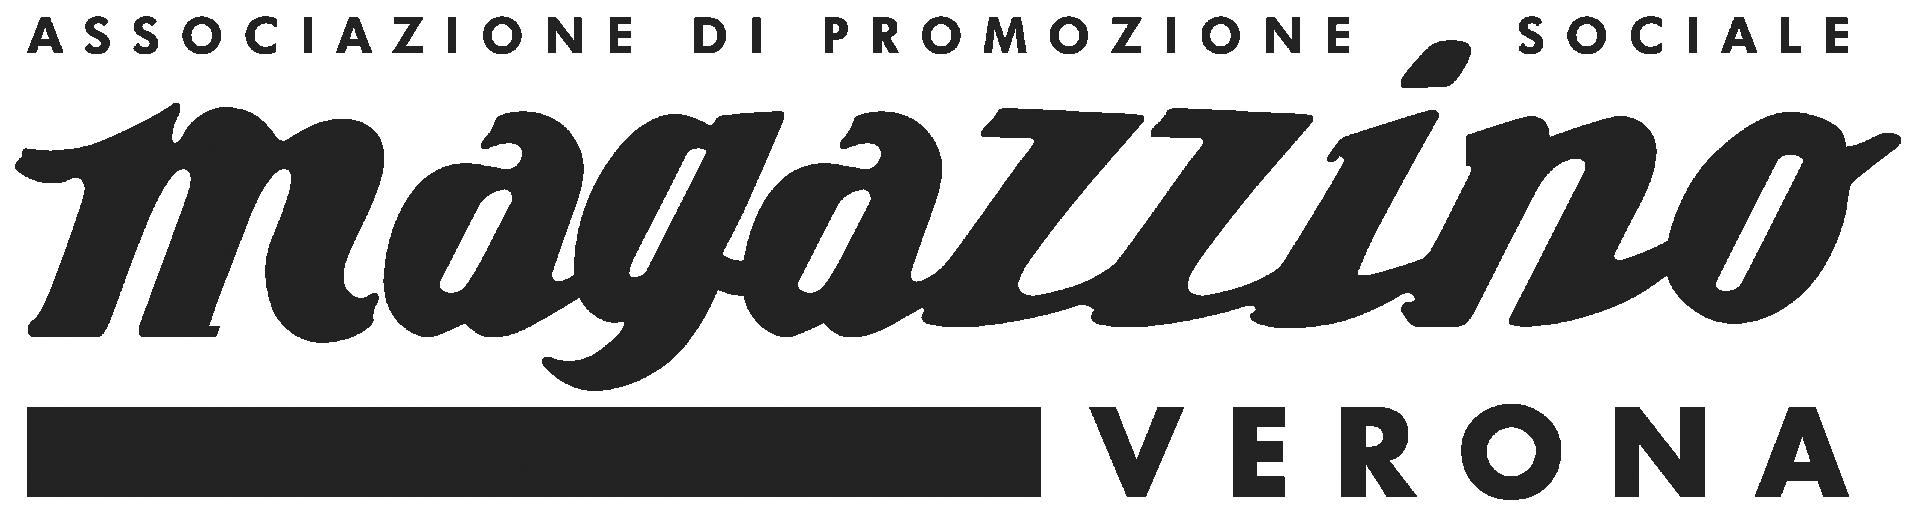 magazzino-verona-logo-ok.png